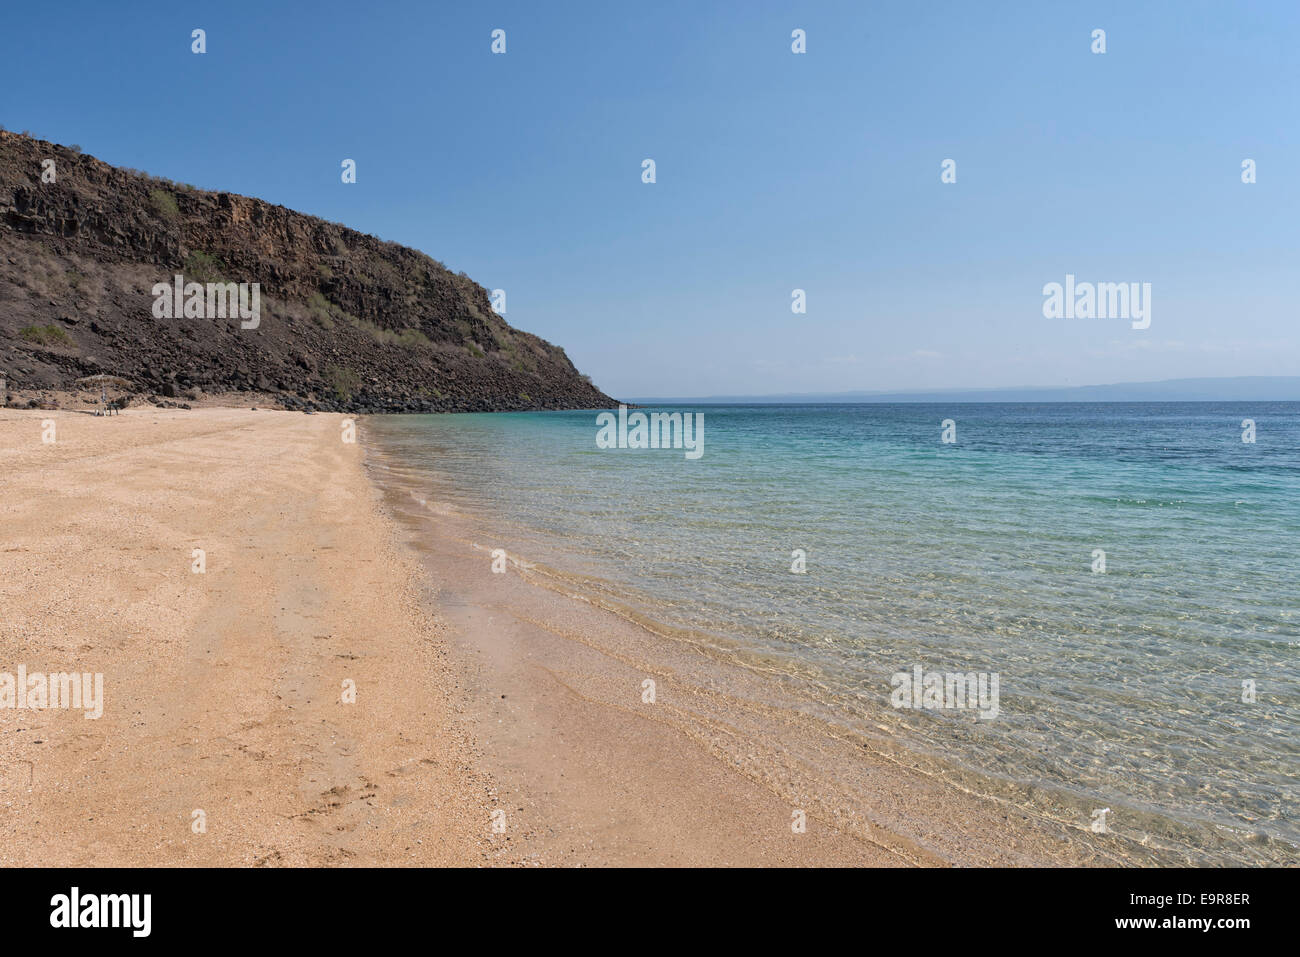 Les Sables Beach, Djibouti - Stock Image